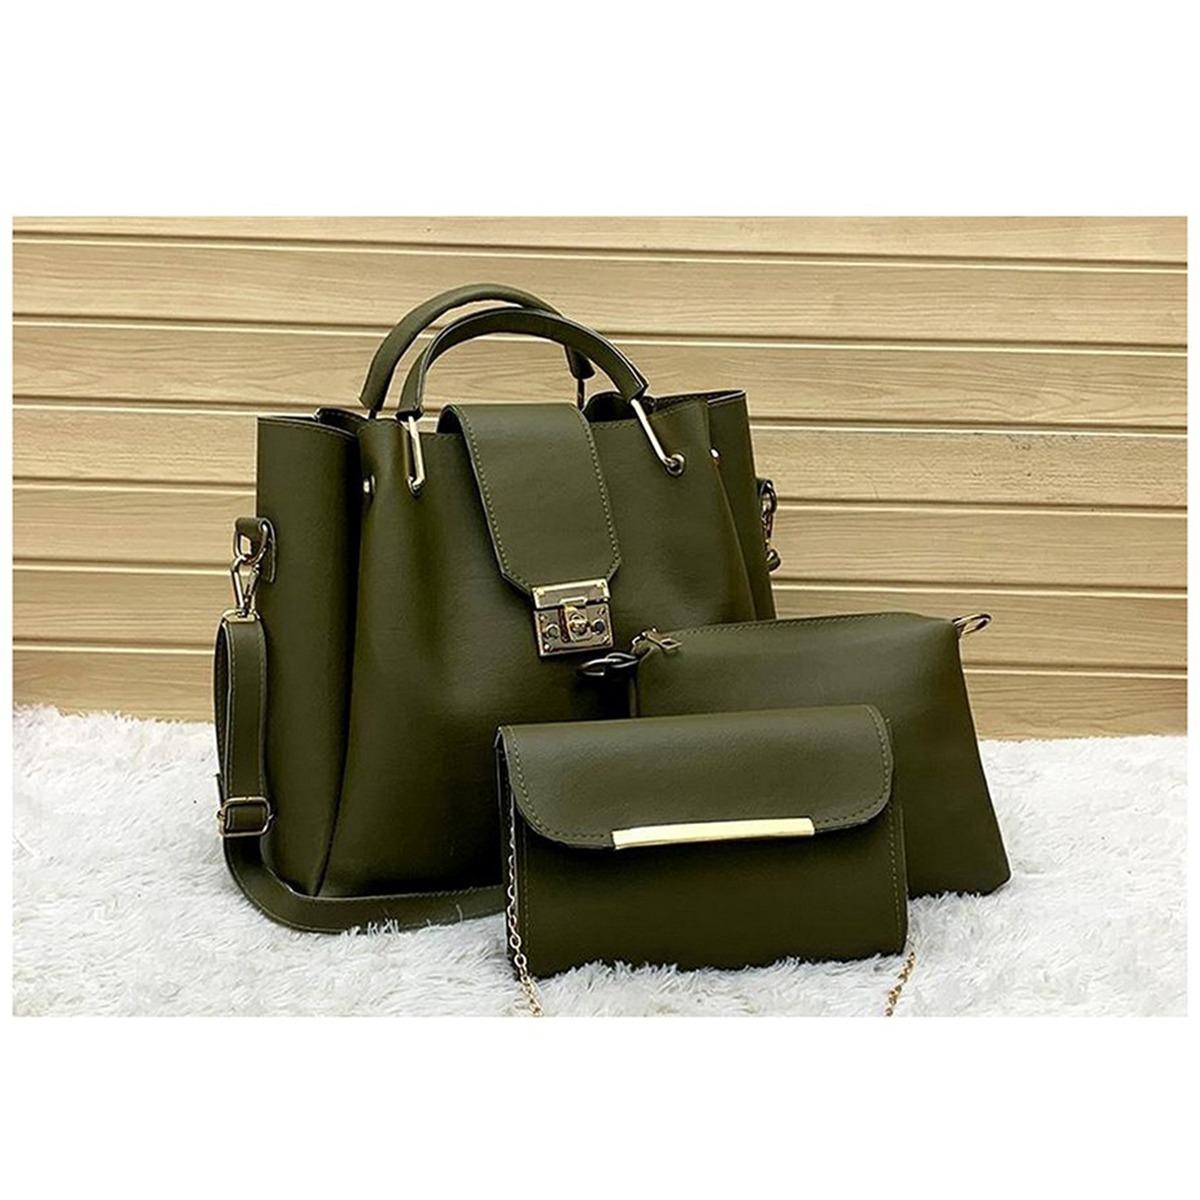 Latest 3 PCS Dual Phase PU Leather Hand Bag Set